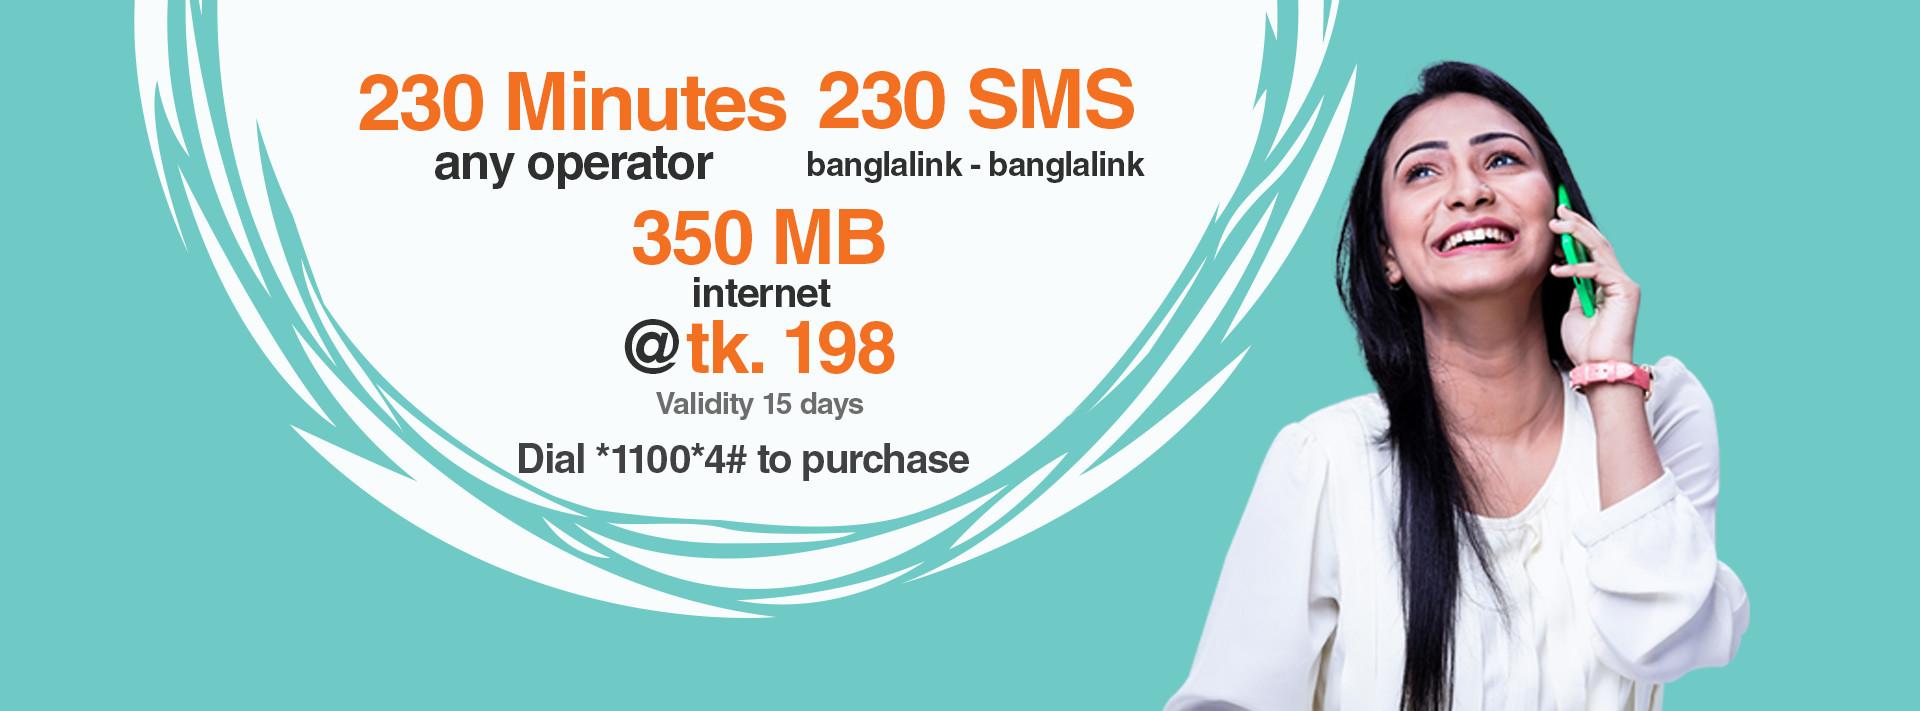 banglalink sms pack